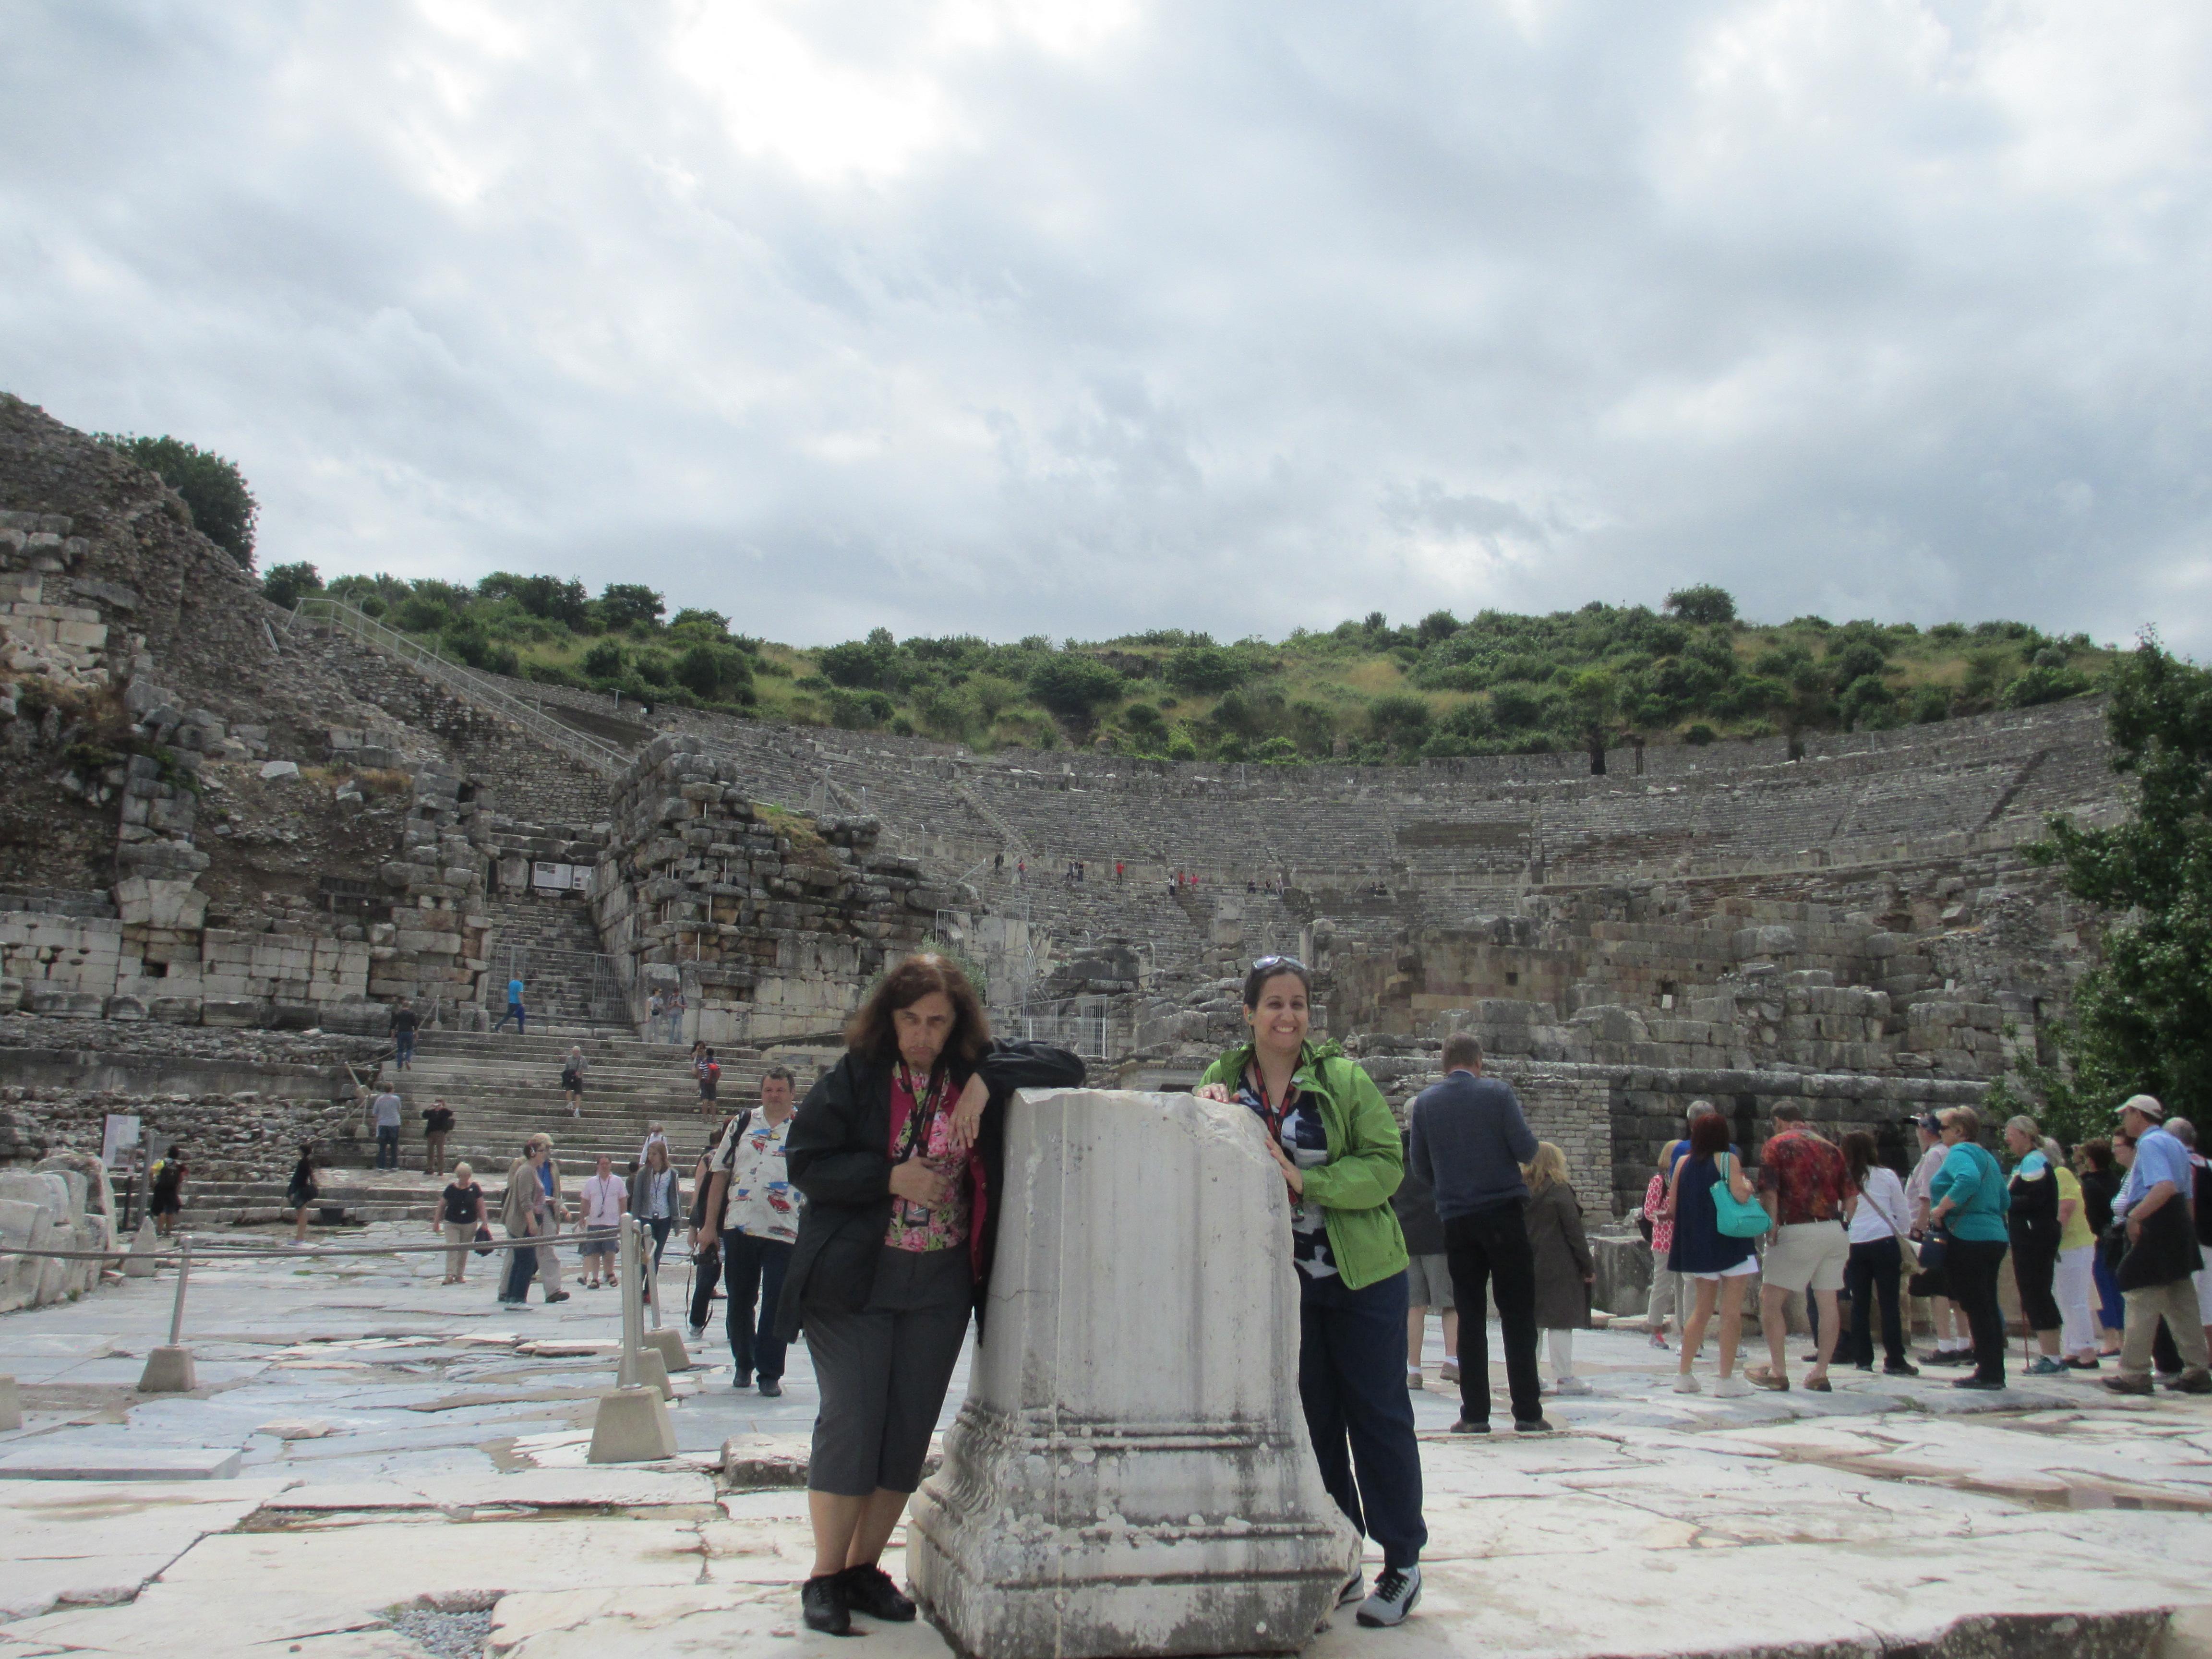 Jennie and Joan Leotta in Ephesus, Turkey, 2015